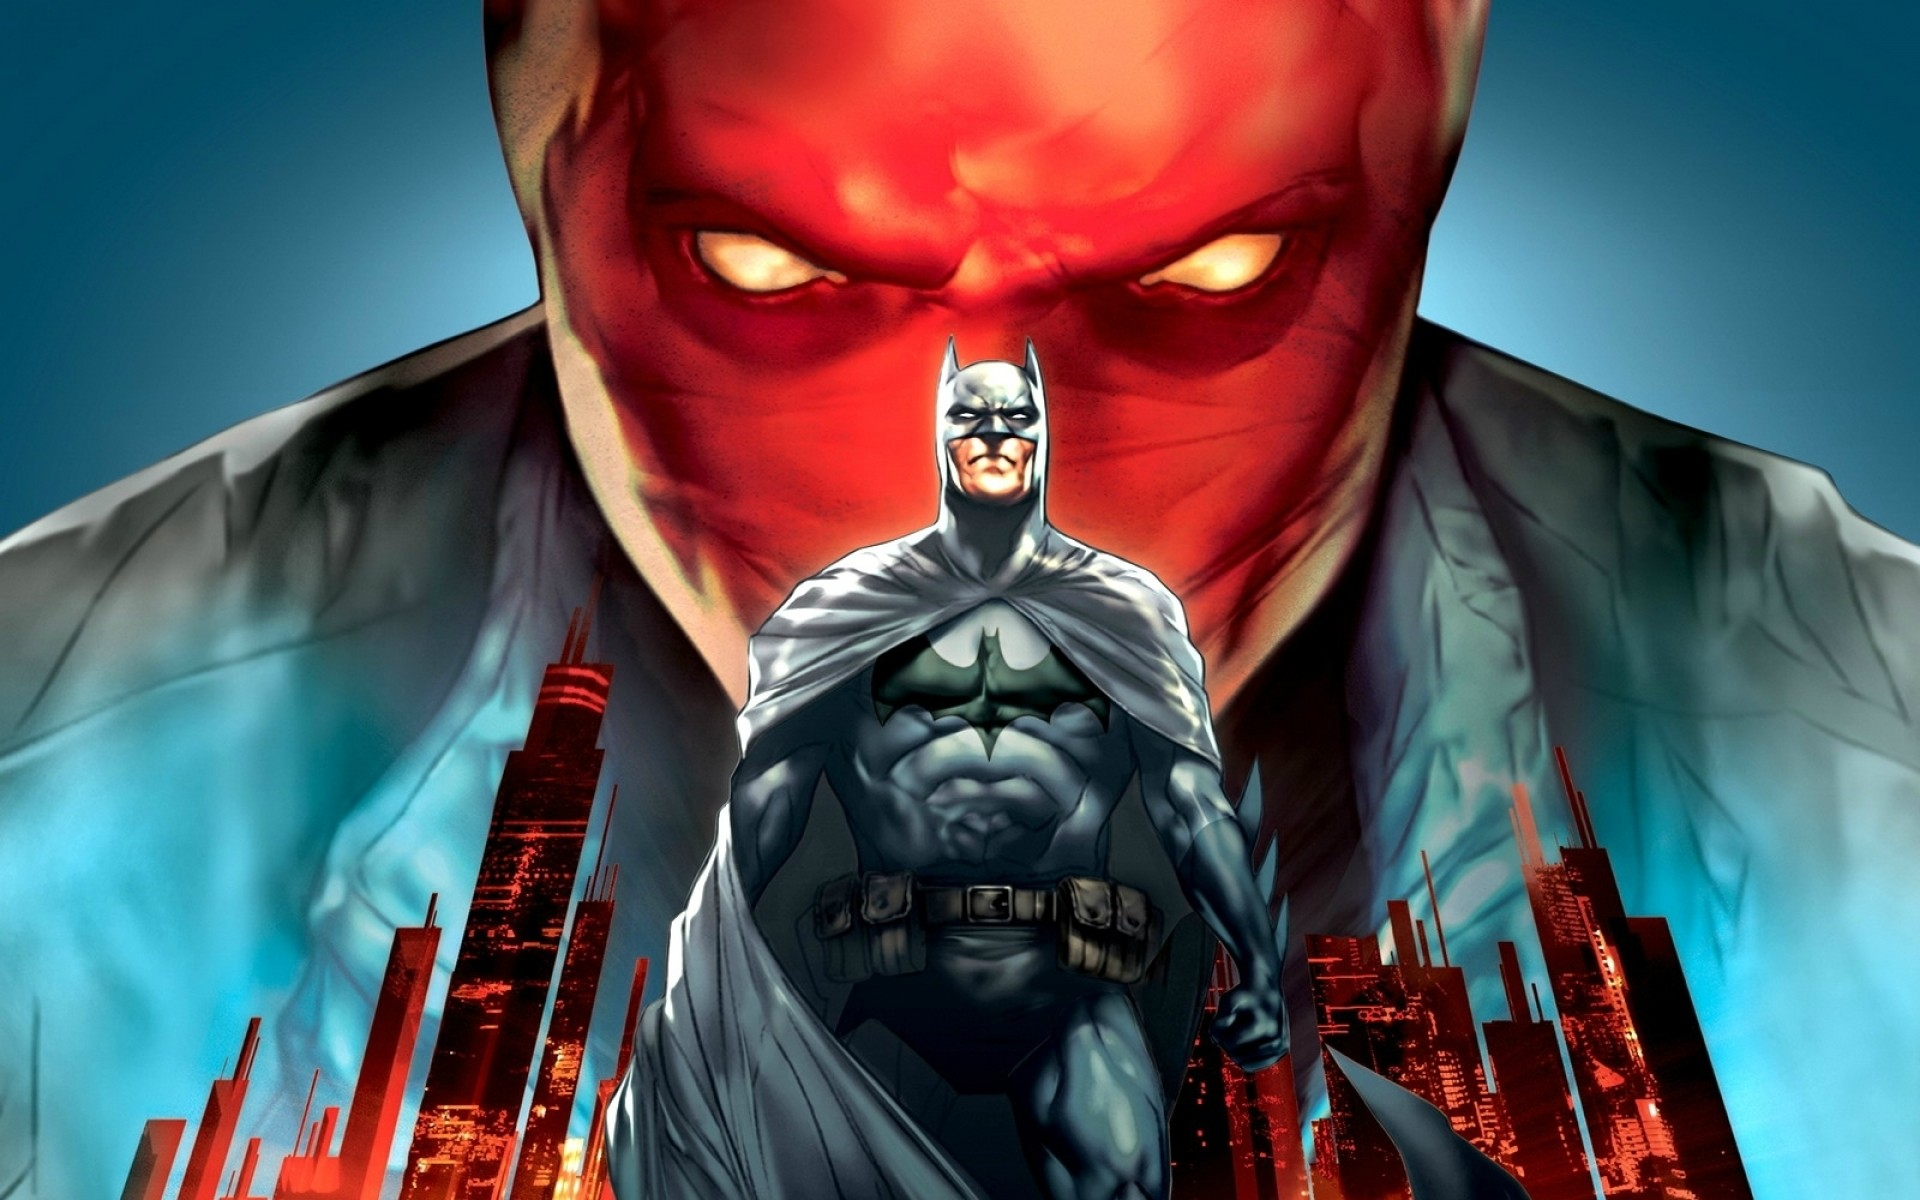 Image – Batman-Wallpaper-Under-the-Red-Hood-Wallpapers-